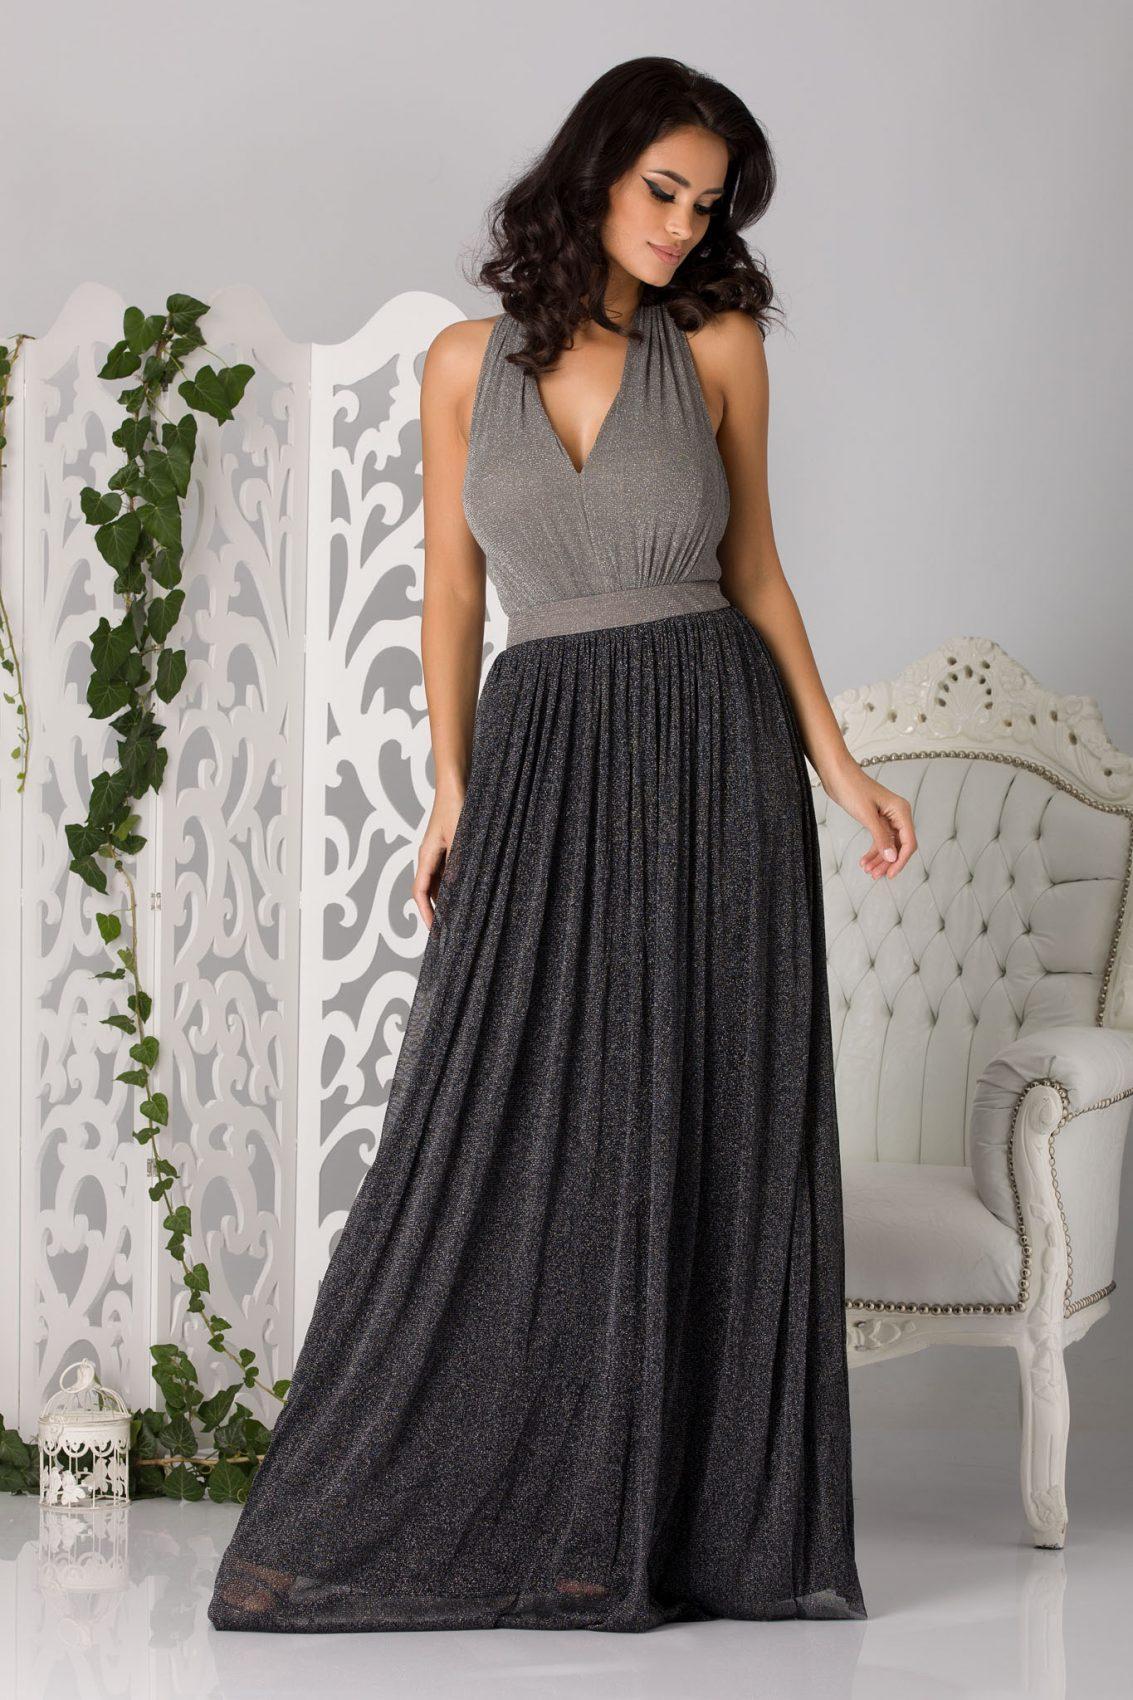 Zephira Black Dress